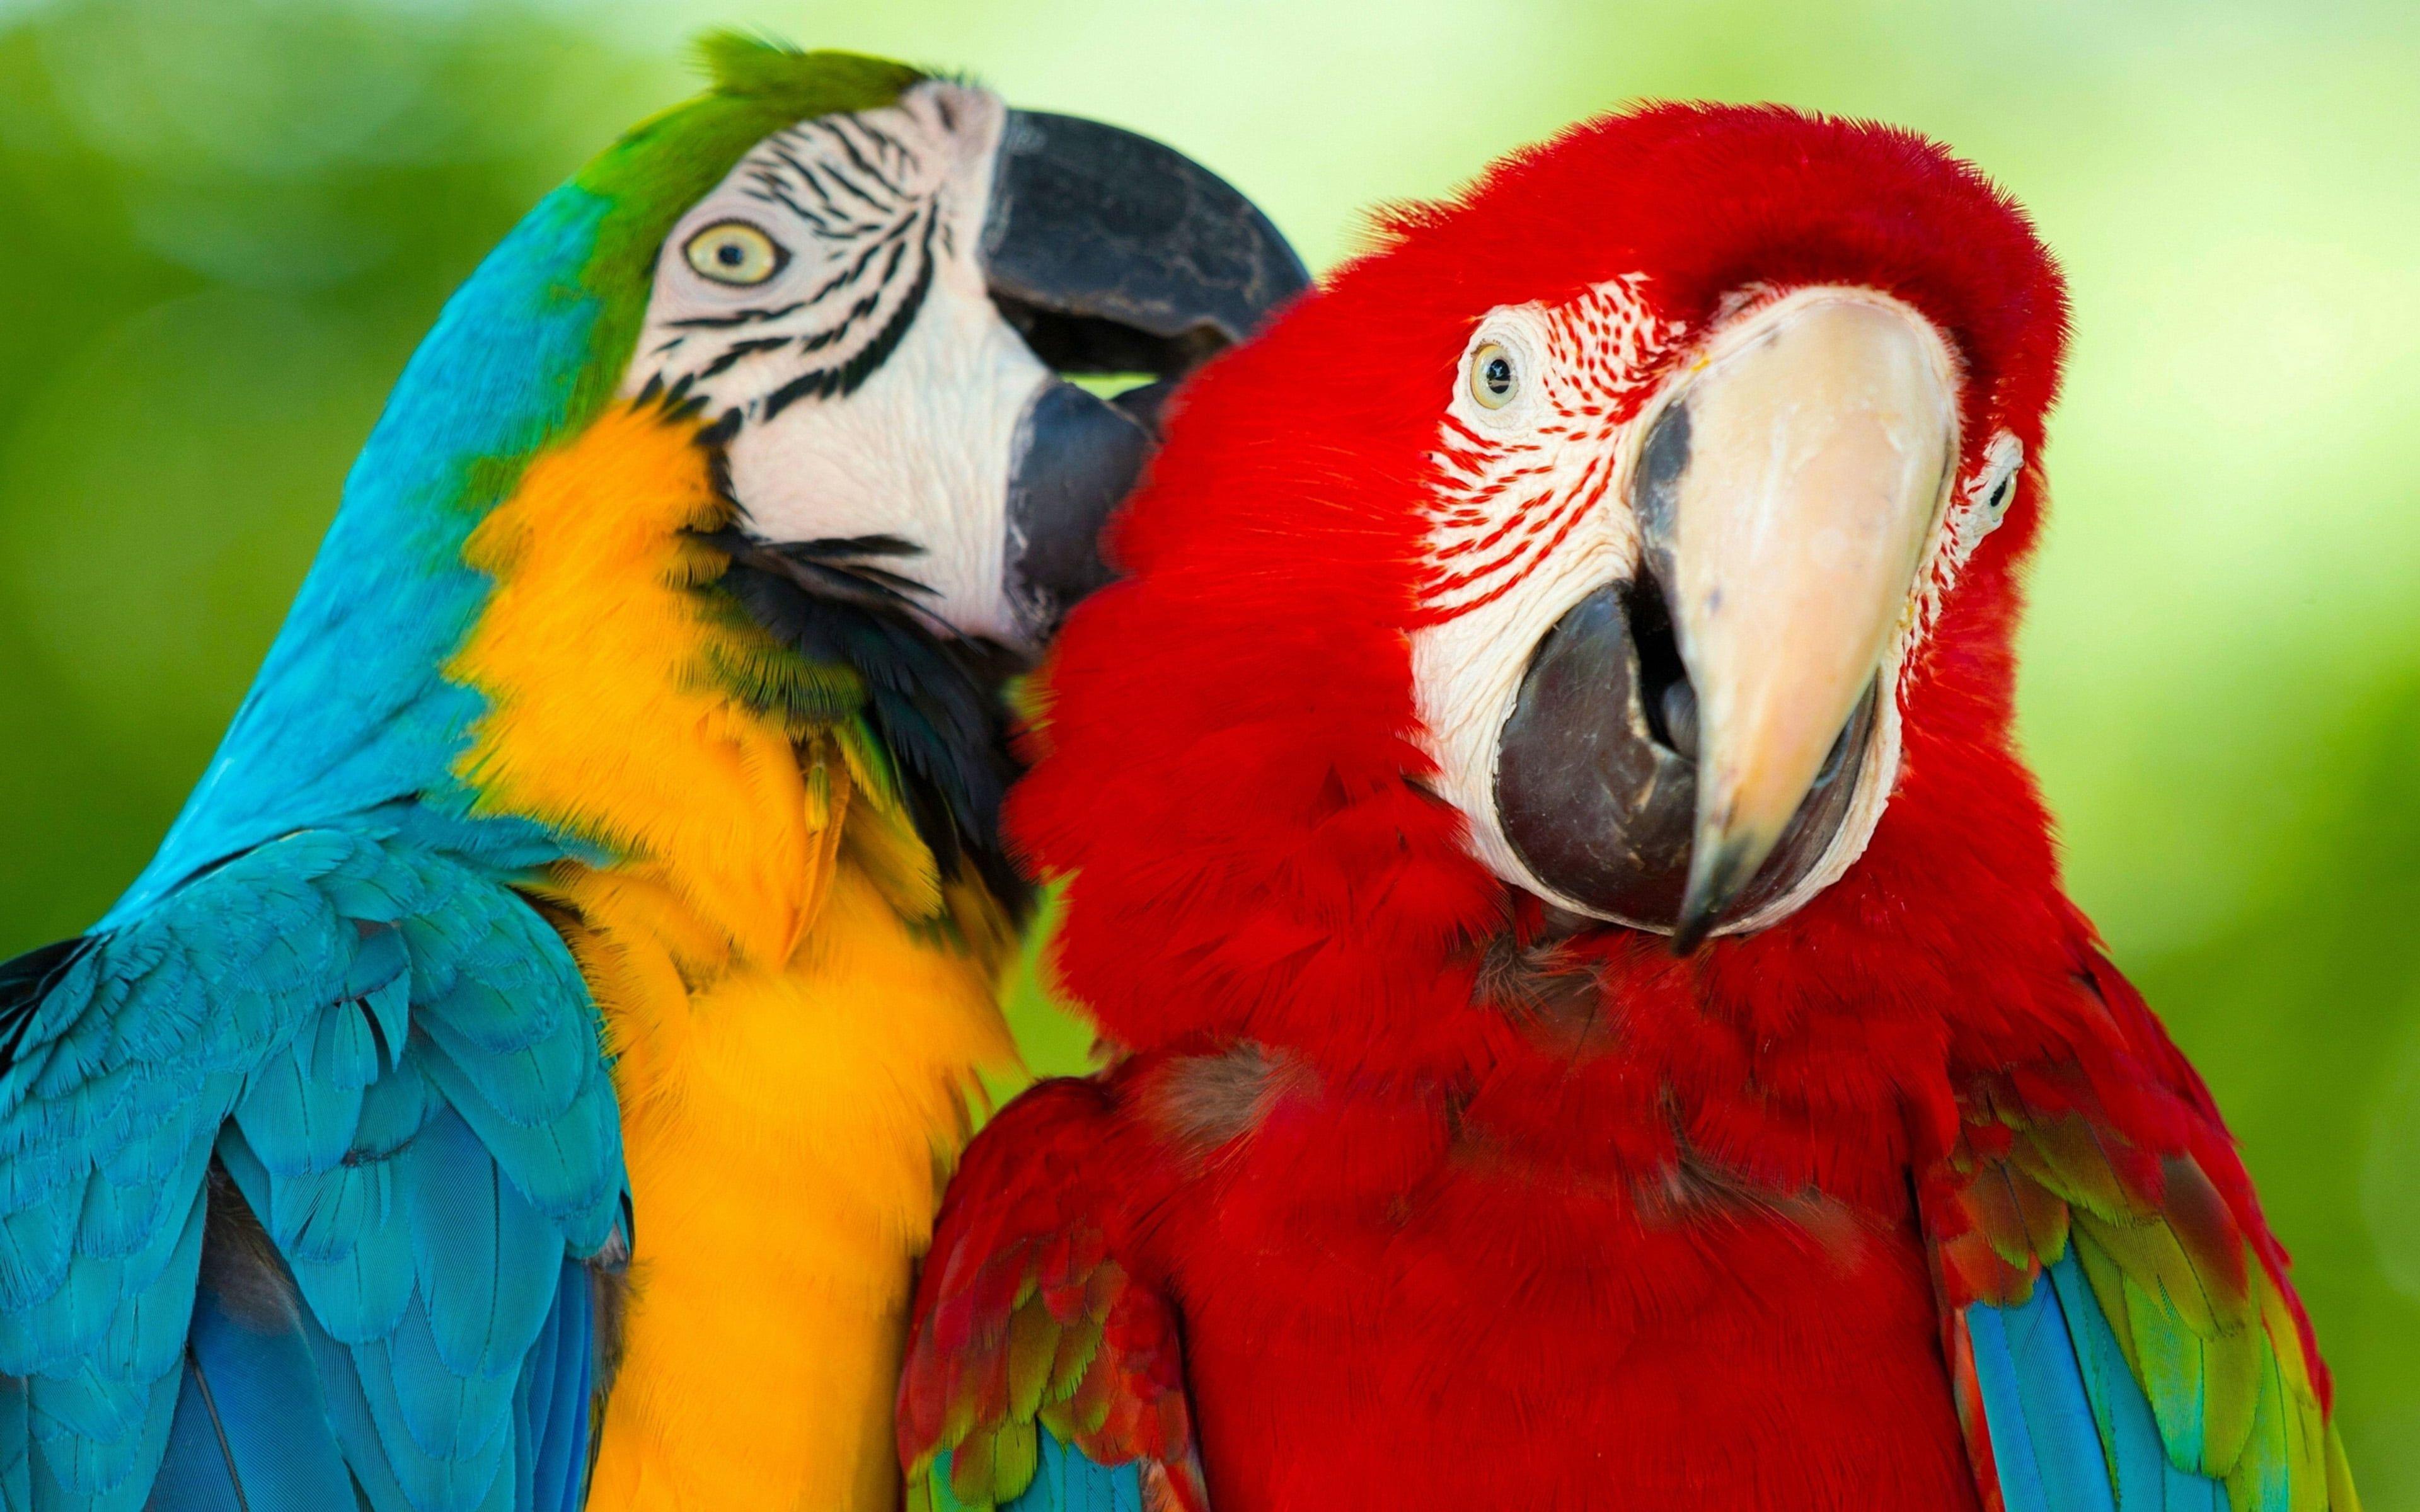 Parrot Macaw Bird Hd Wallpaper Background Mobile Phone Laptop 3840 2400 4k Wallpaper Hdwallpaper Desktop In 2021 Parrot Macaw Parrot Images Macaw